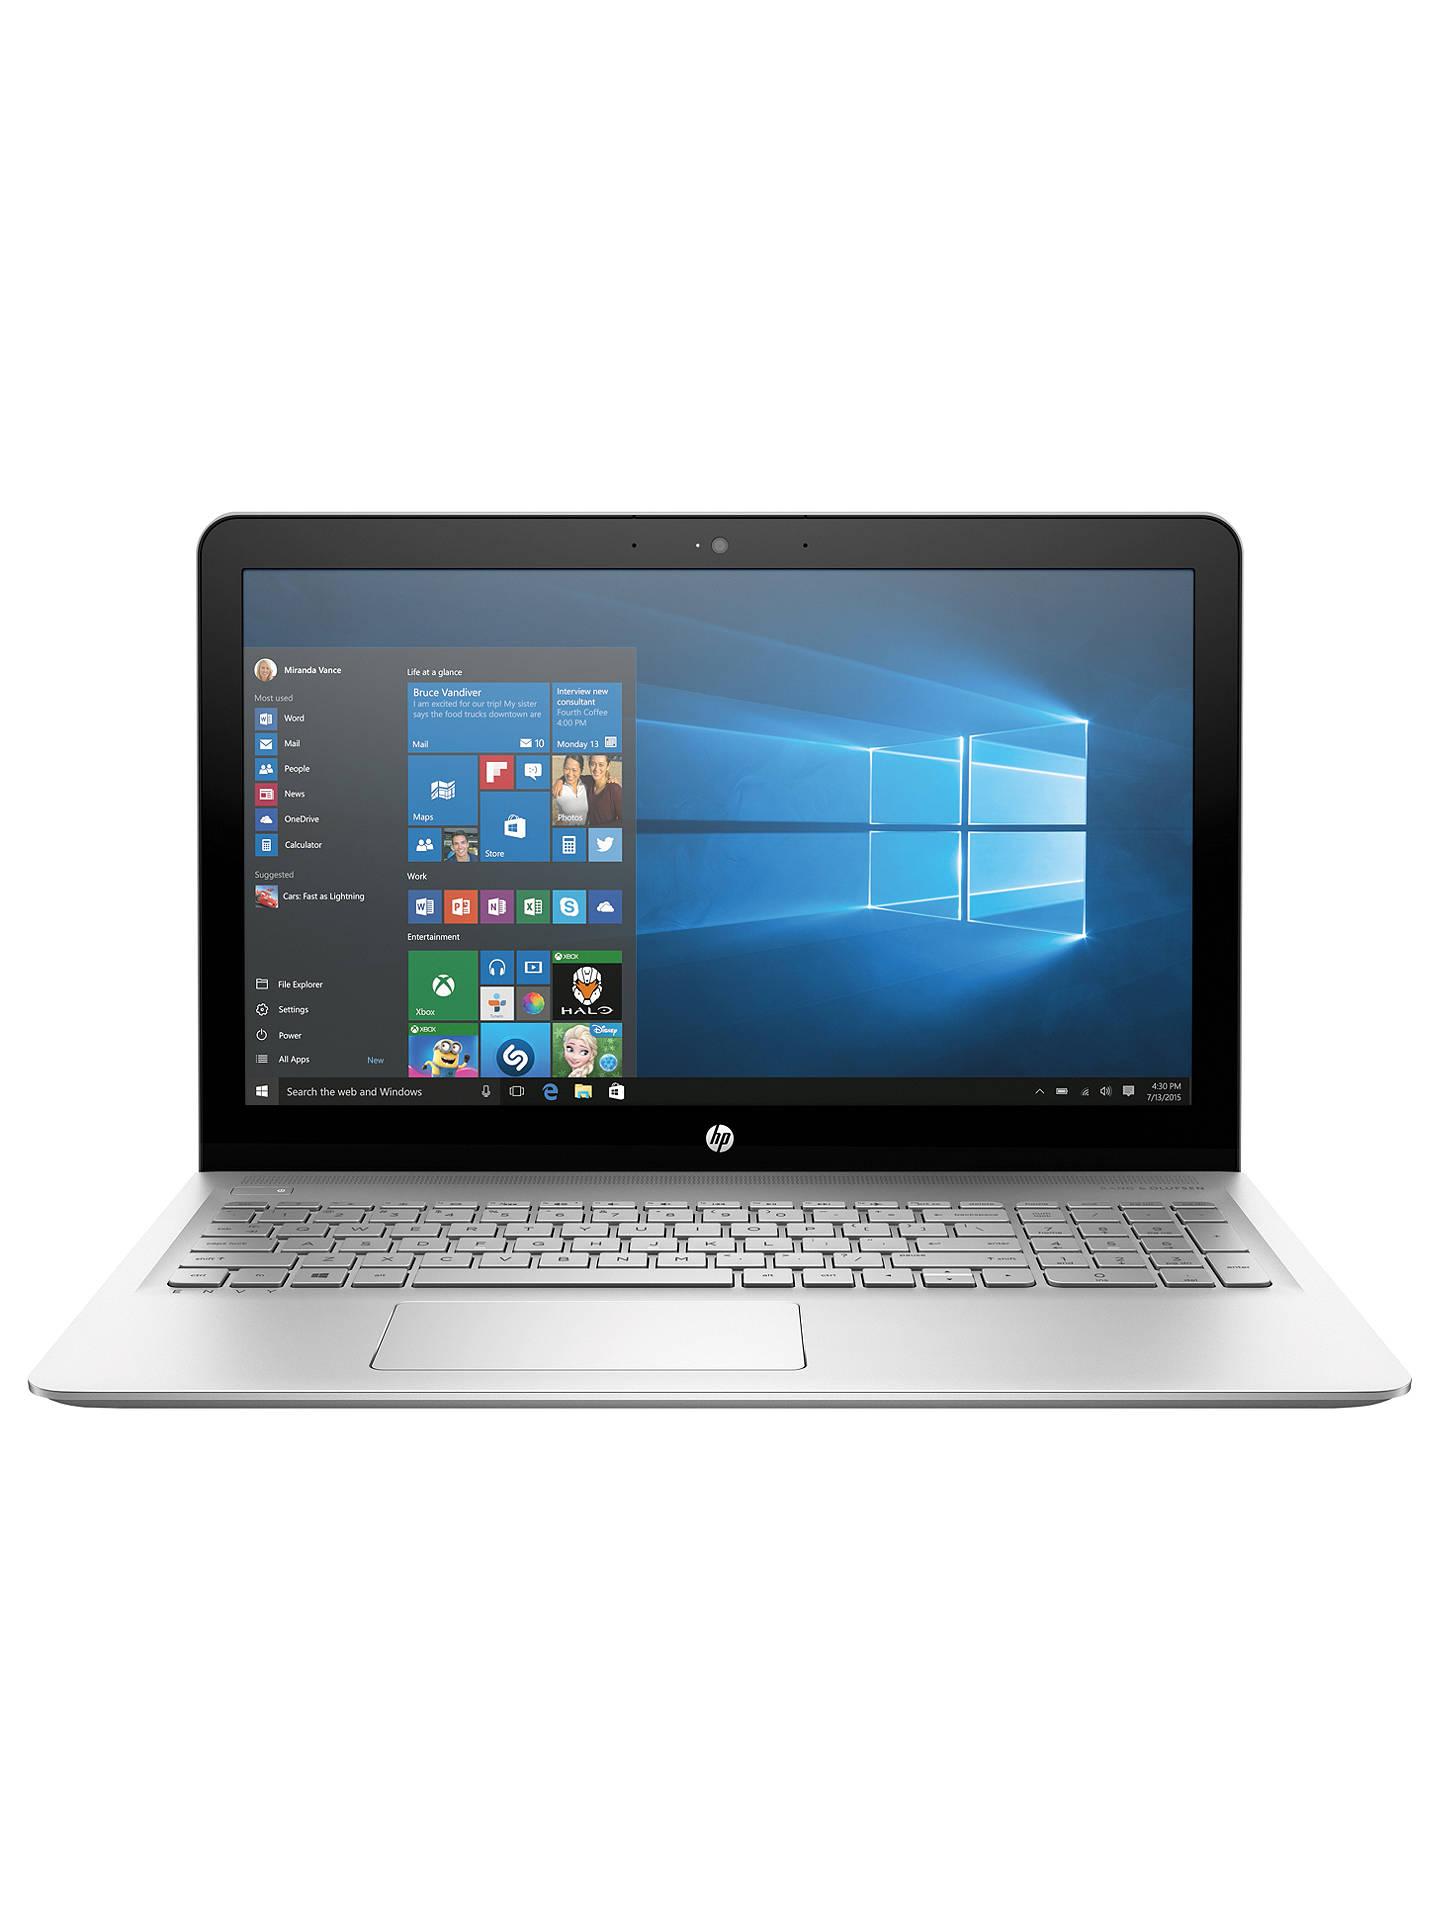 HP ENVY 15-as103na Laptop, Intel Core i7, 8GB RAM, 1TB HDD + 128GB